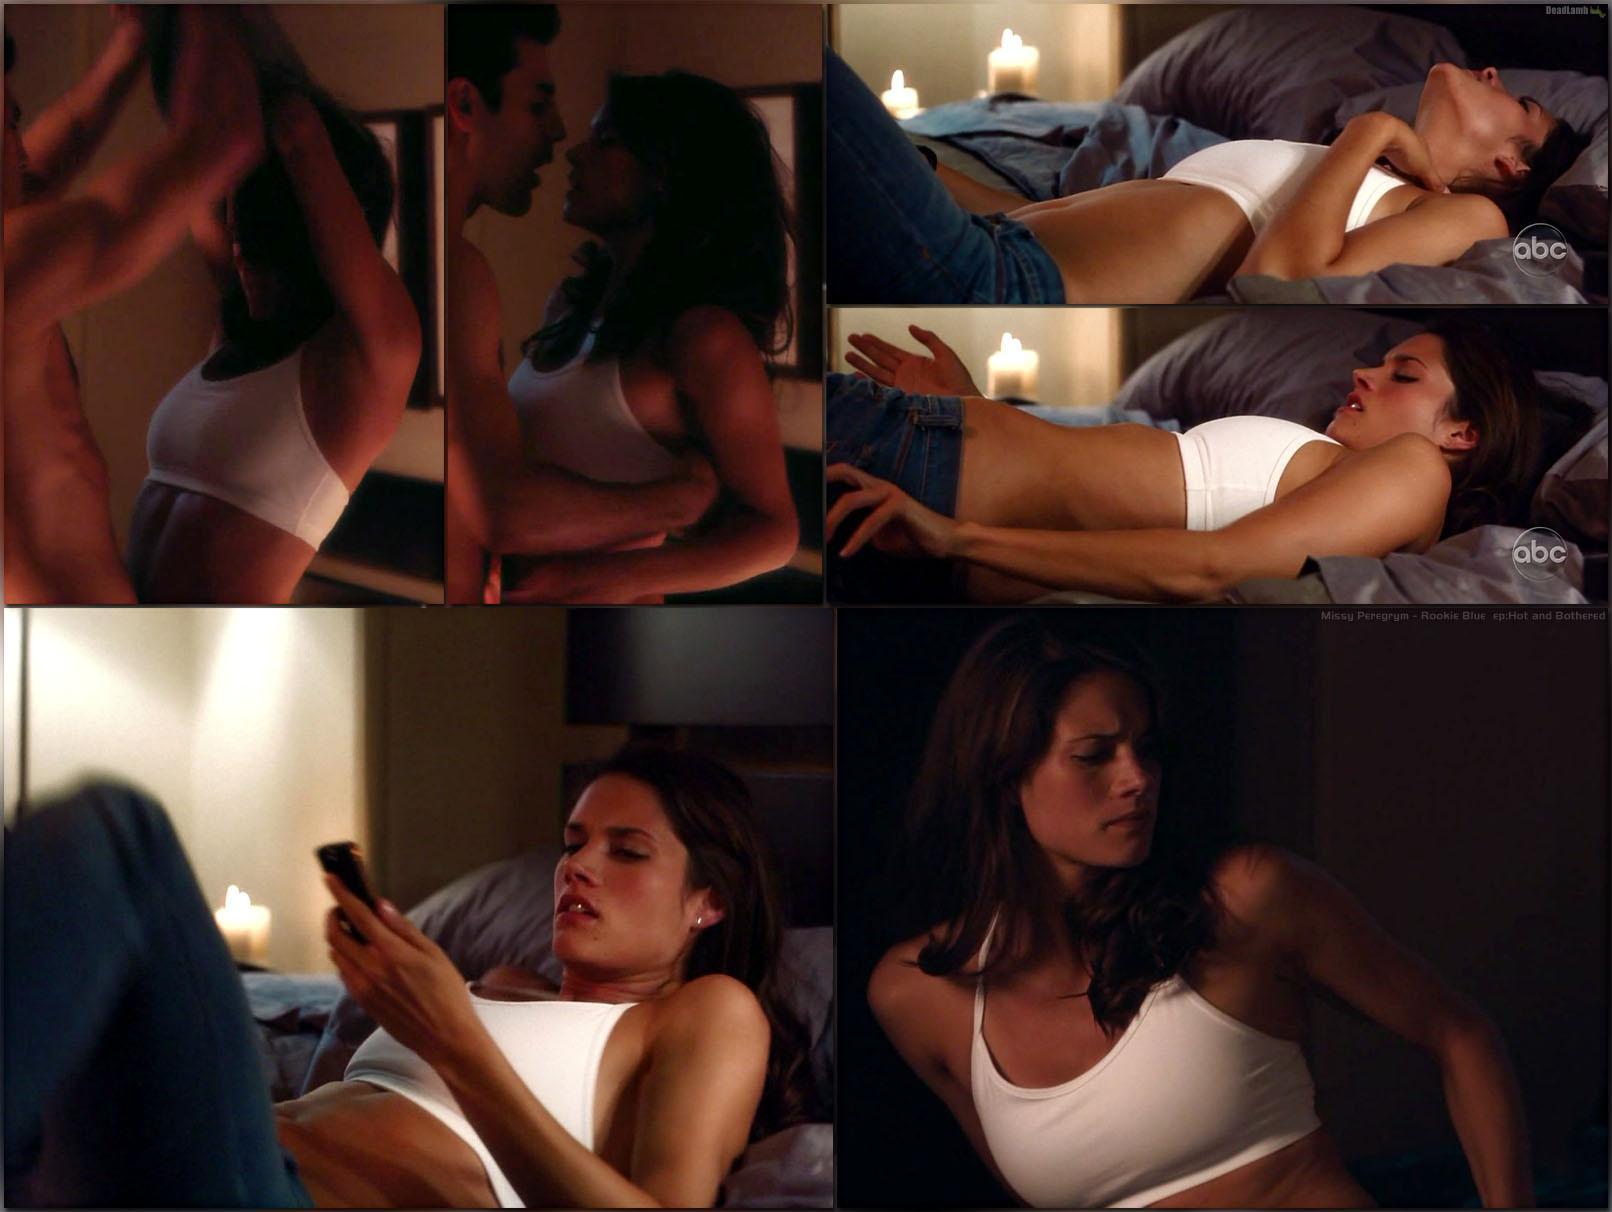 Missy Peregrym Nude, Naked